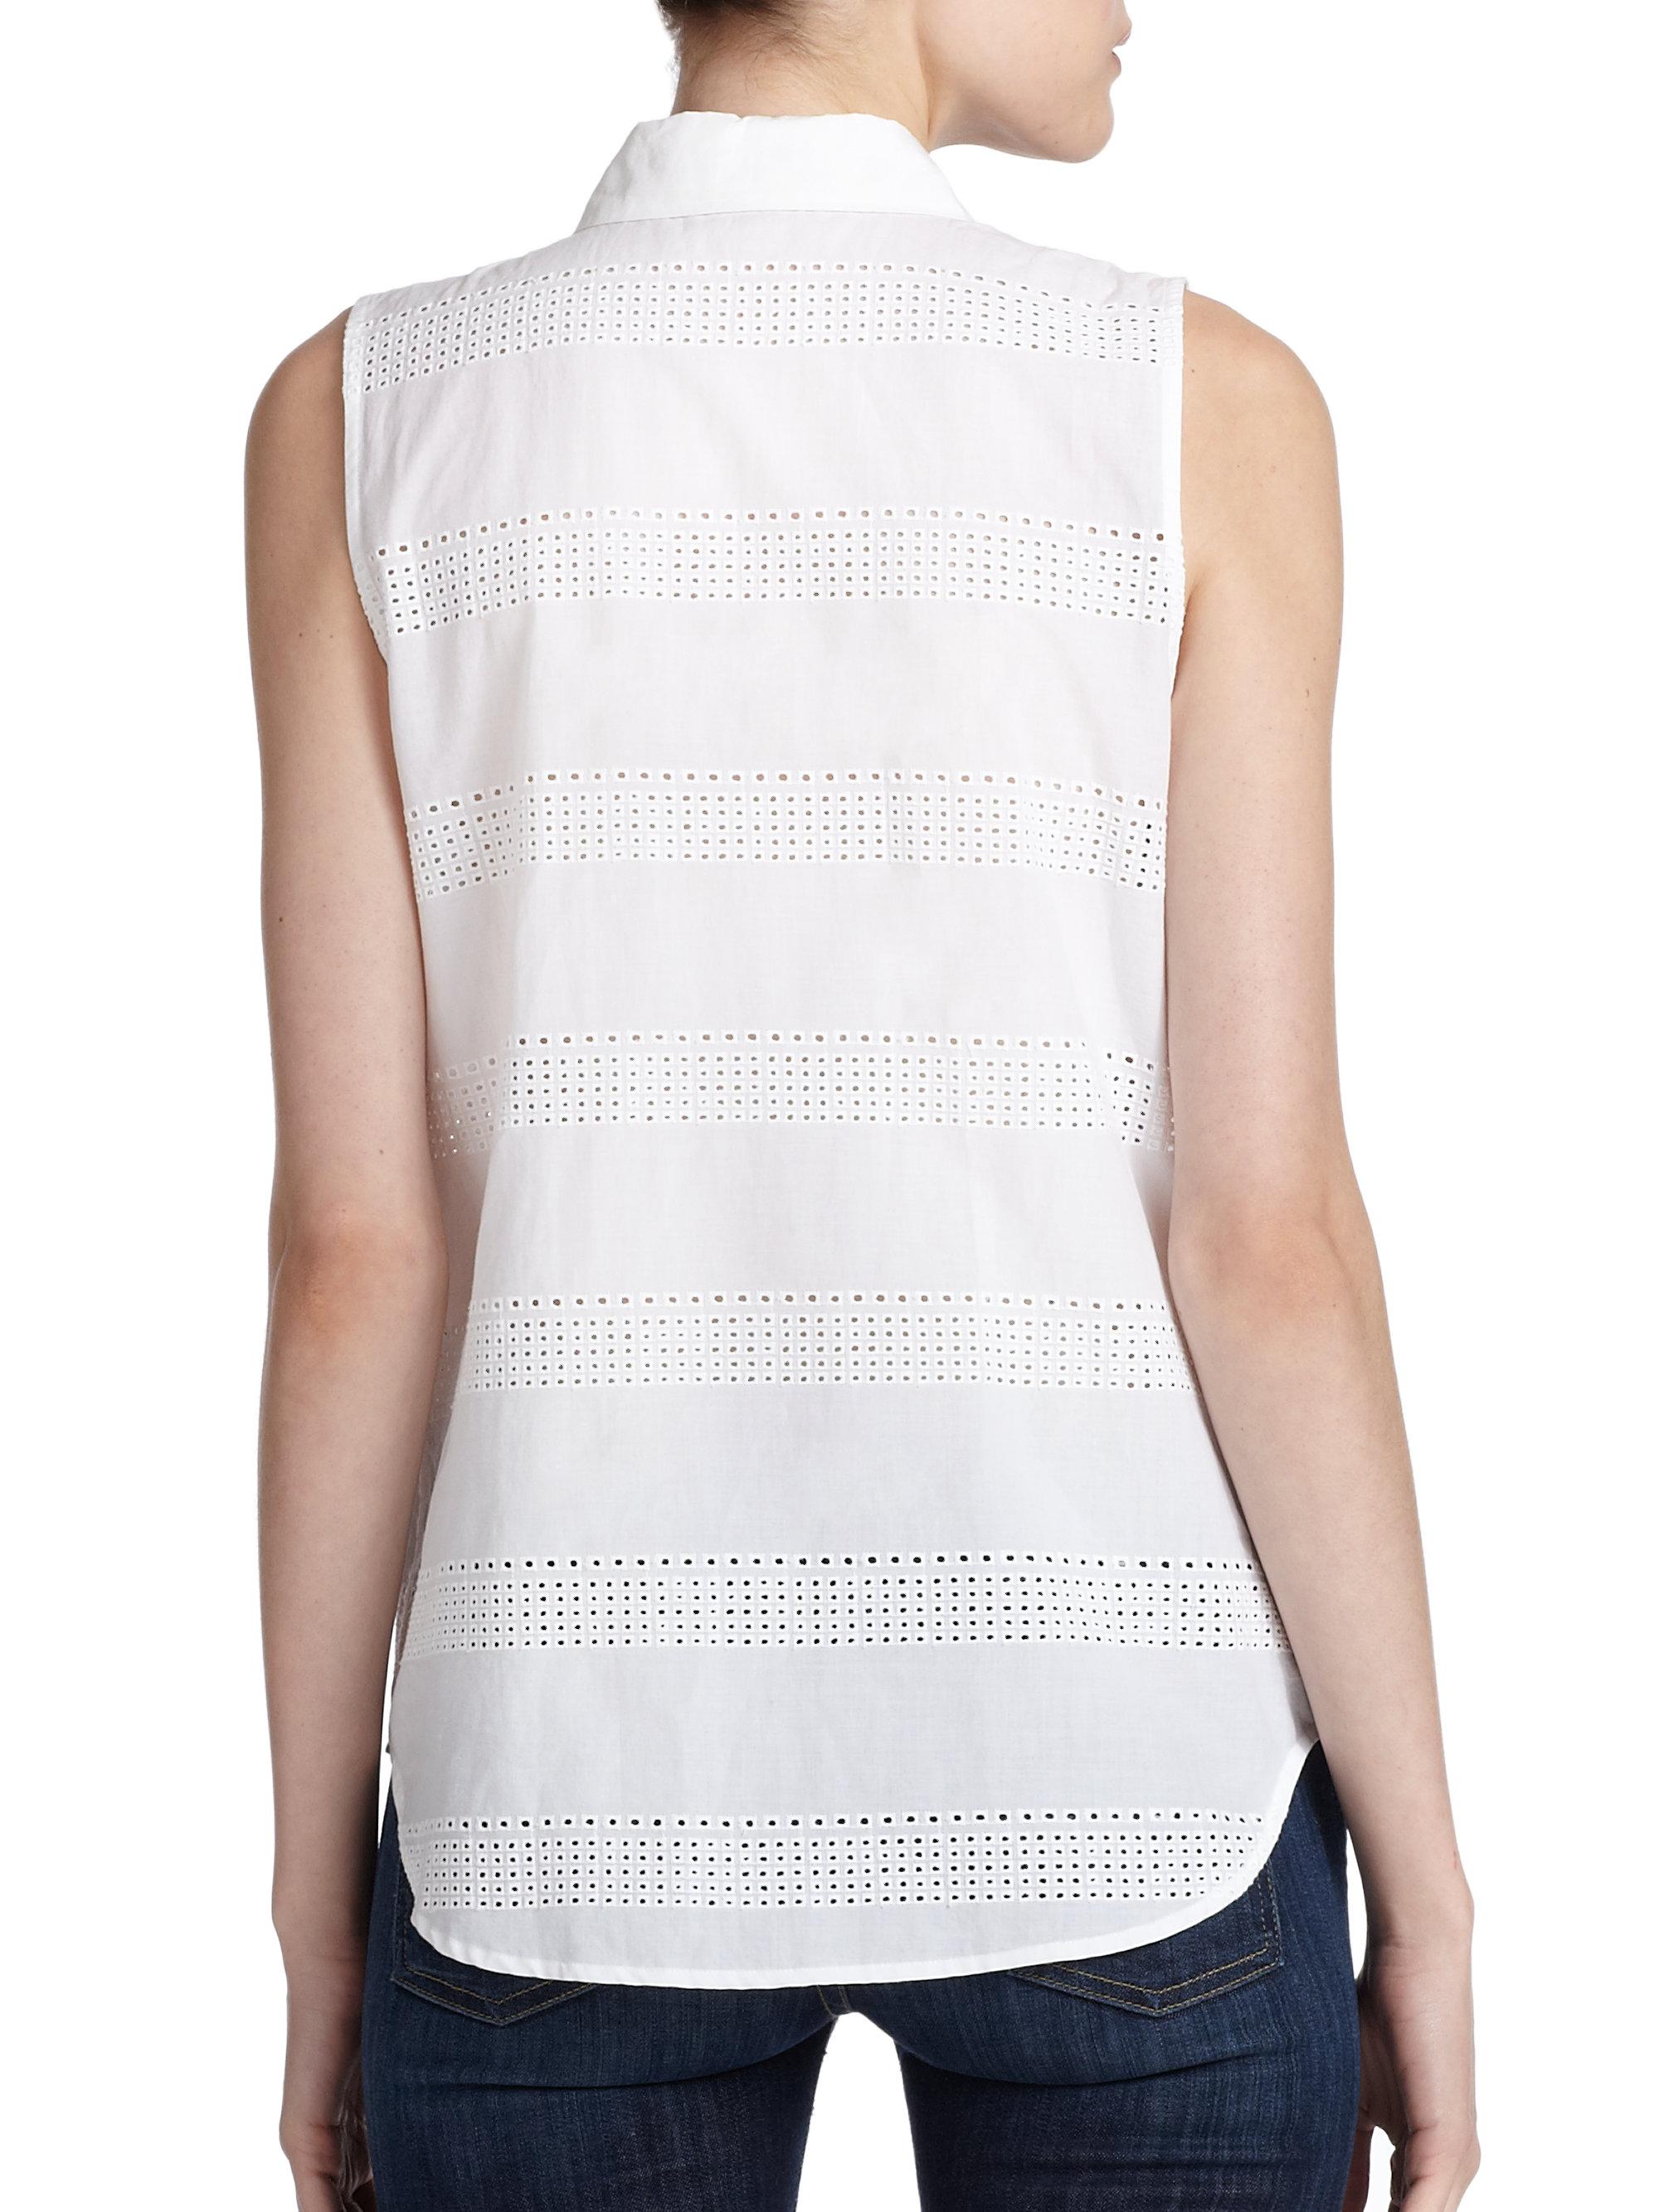 60dd90b9d17044 Lyst - Equipment Colleen Eyelet Cotton Sleeveless Shirt in White